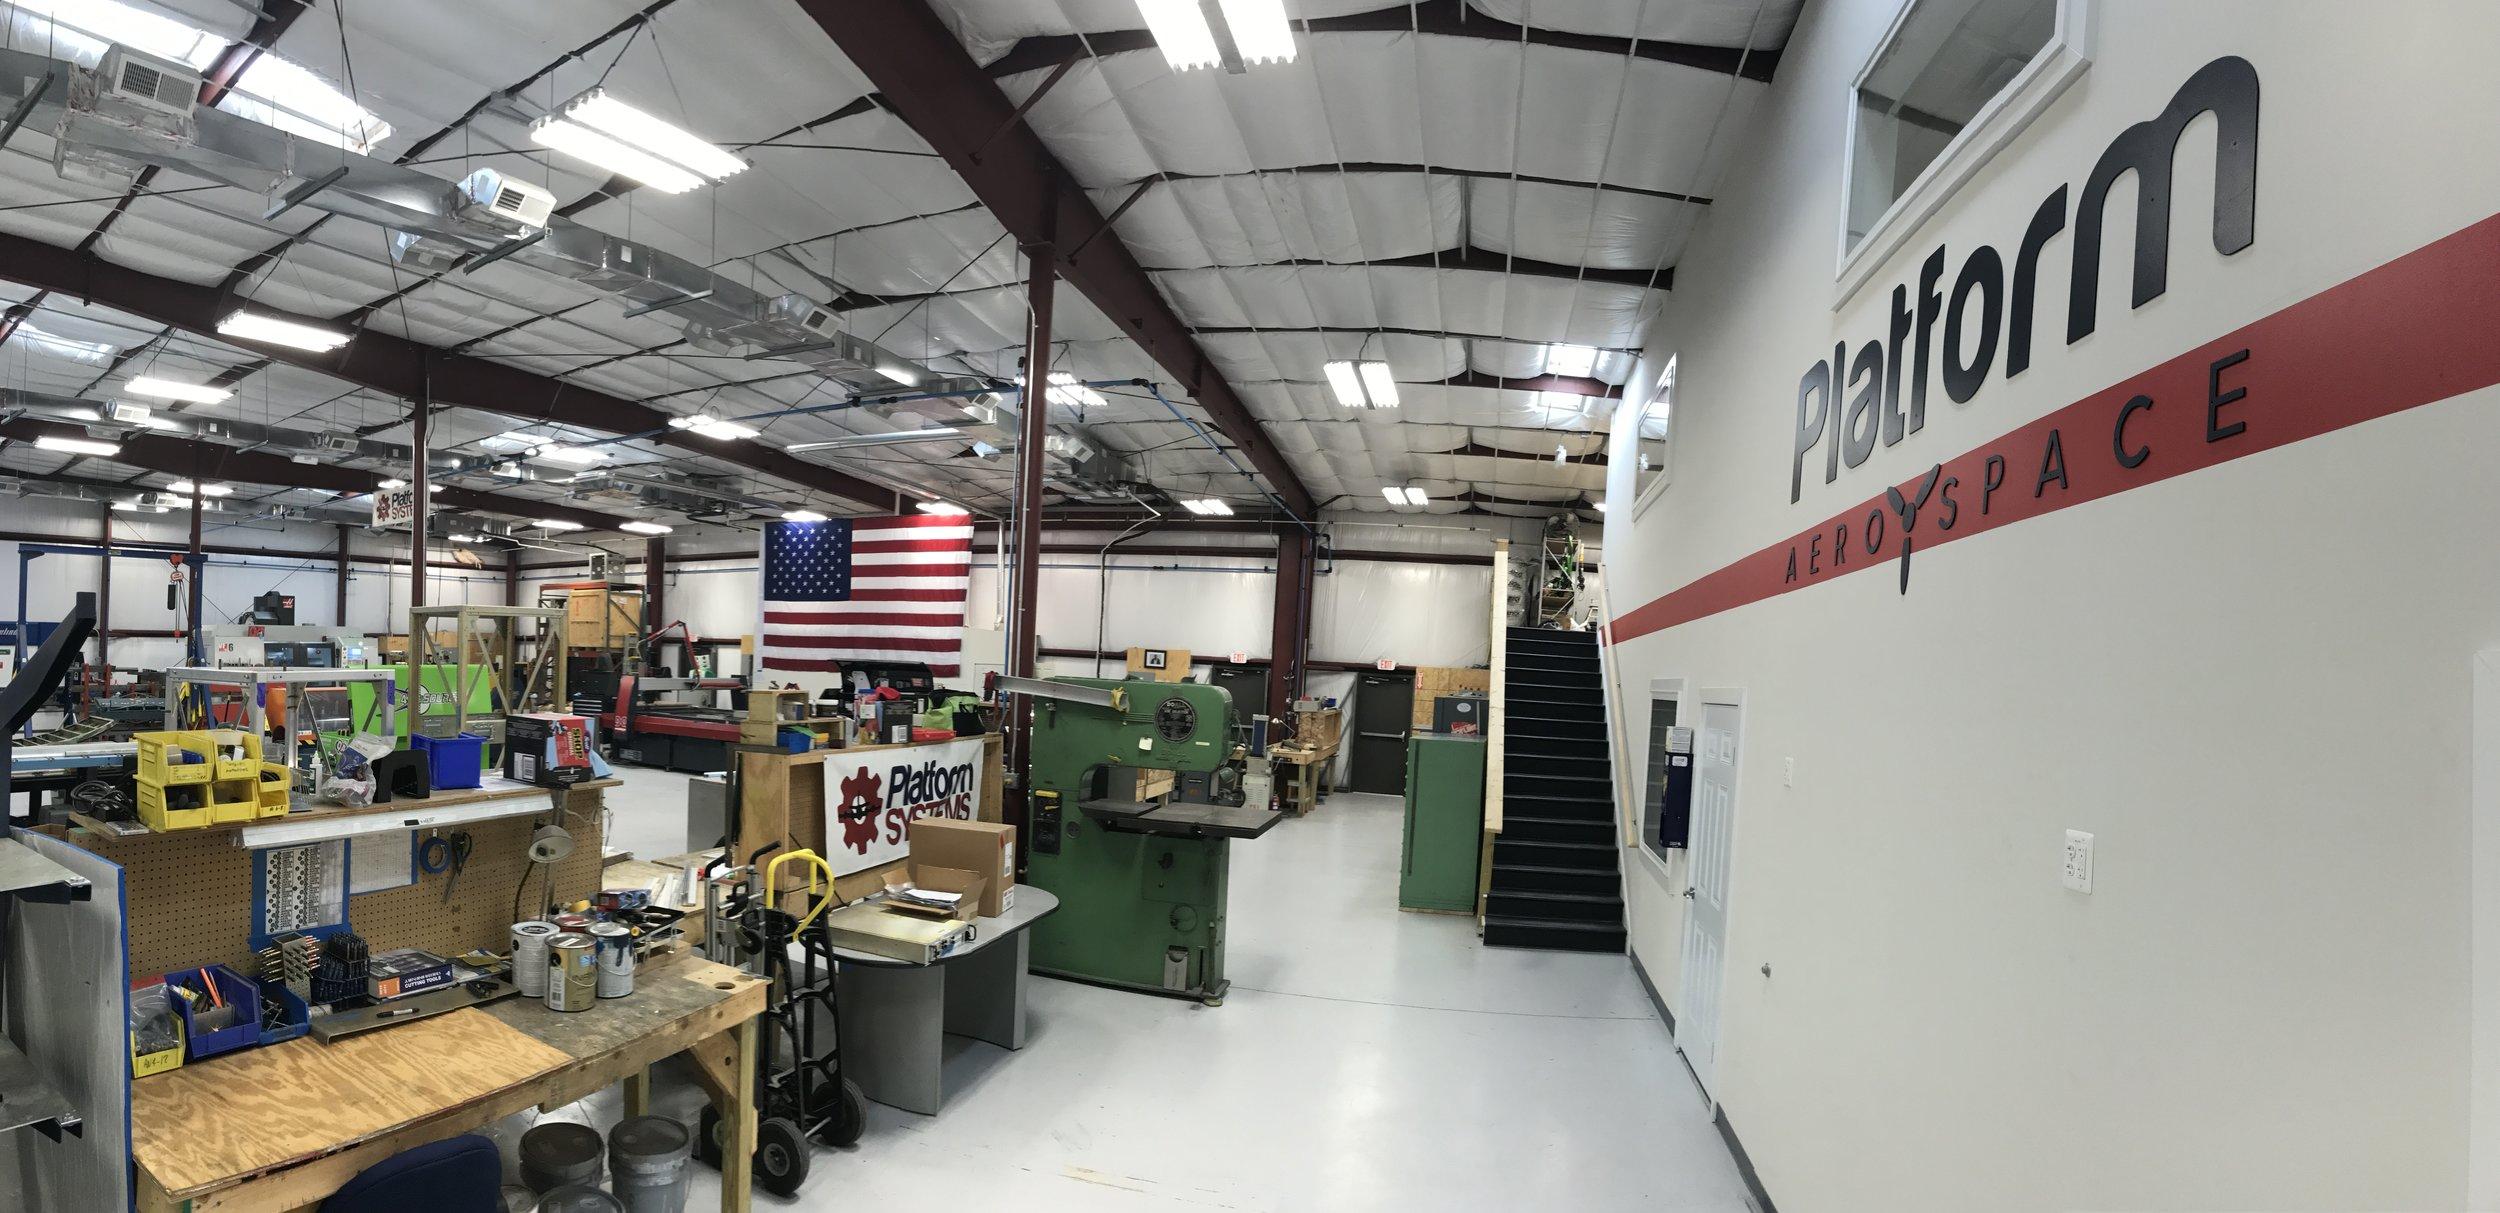 01_Platform Aerospace Machine Shop Floor.JPG